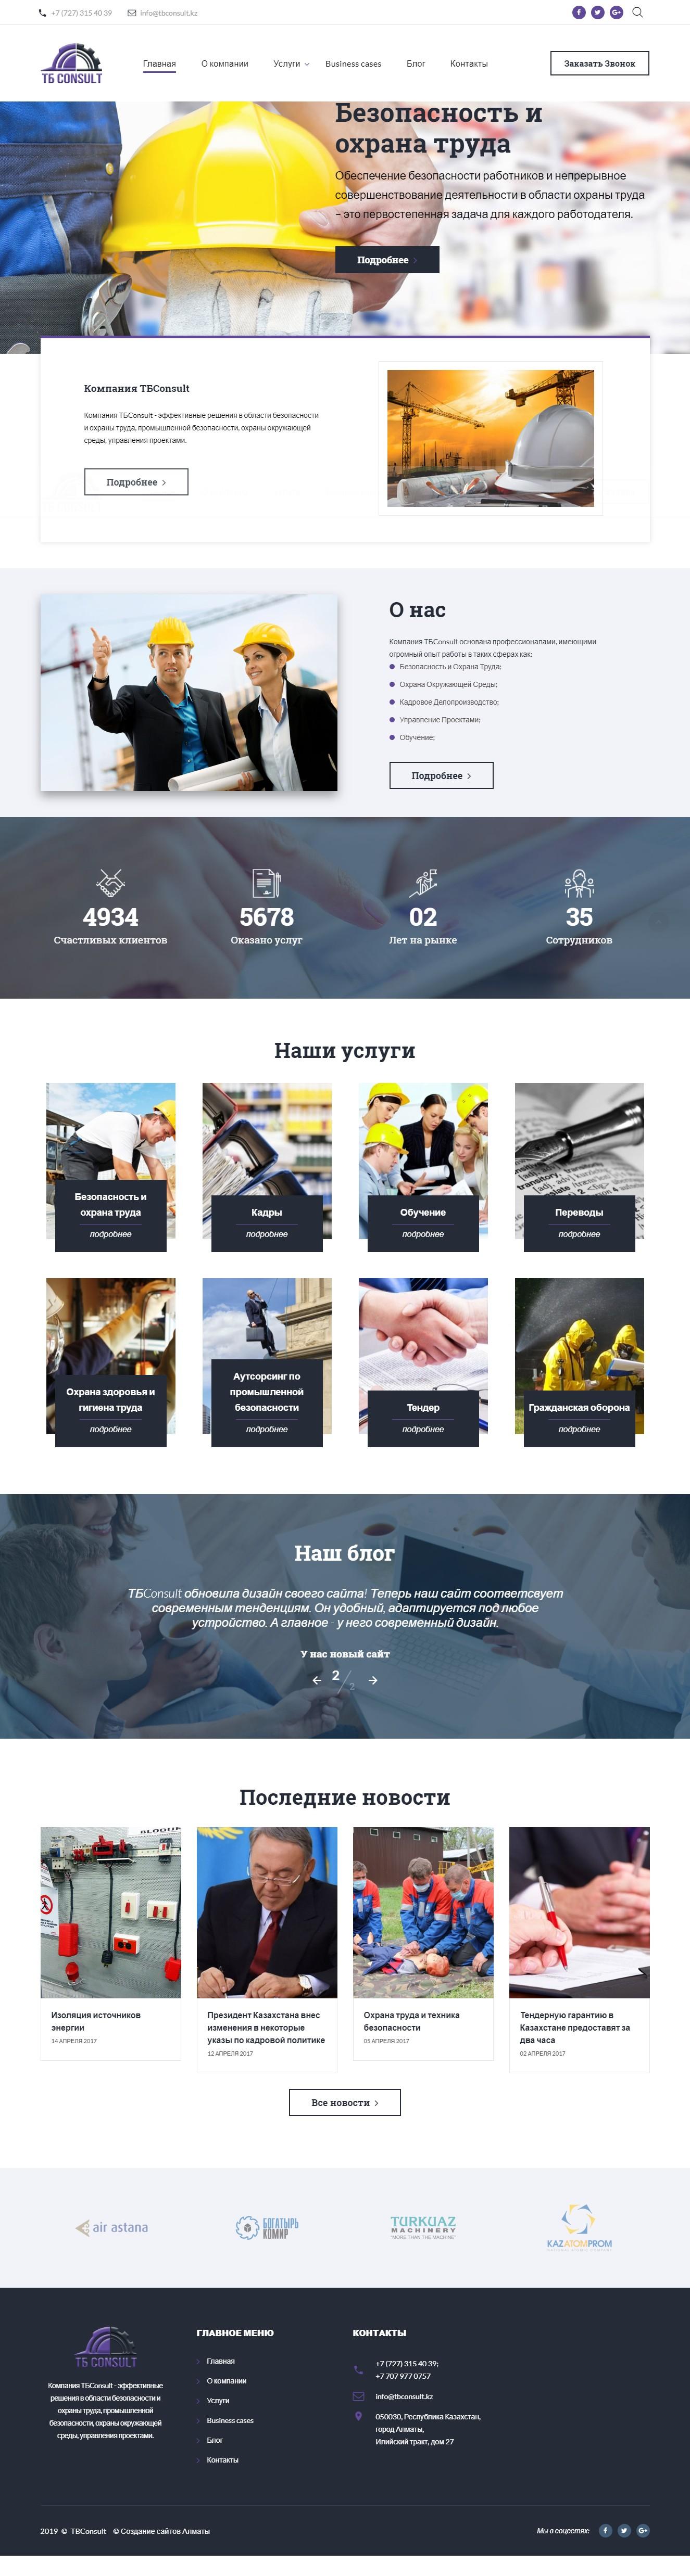 Корпоративный сайт компании TBConsult